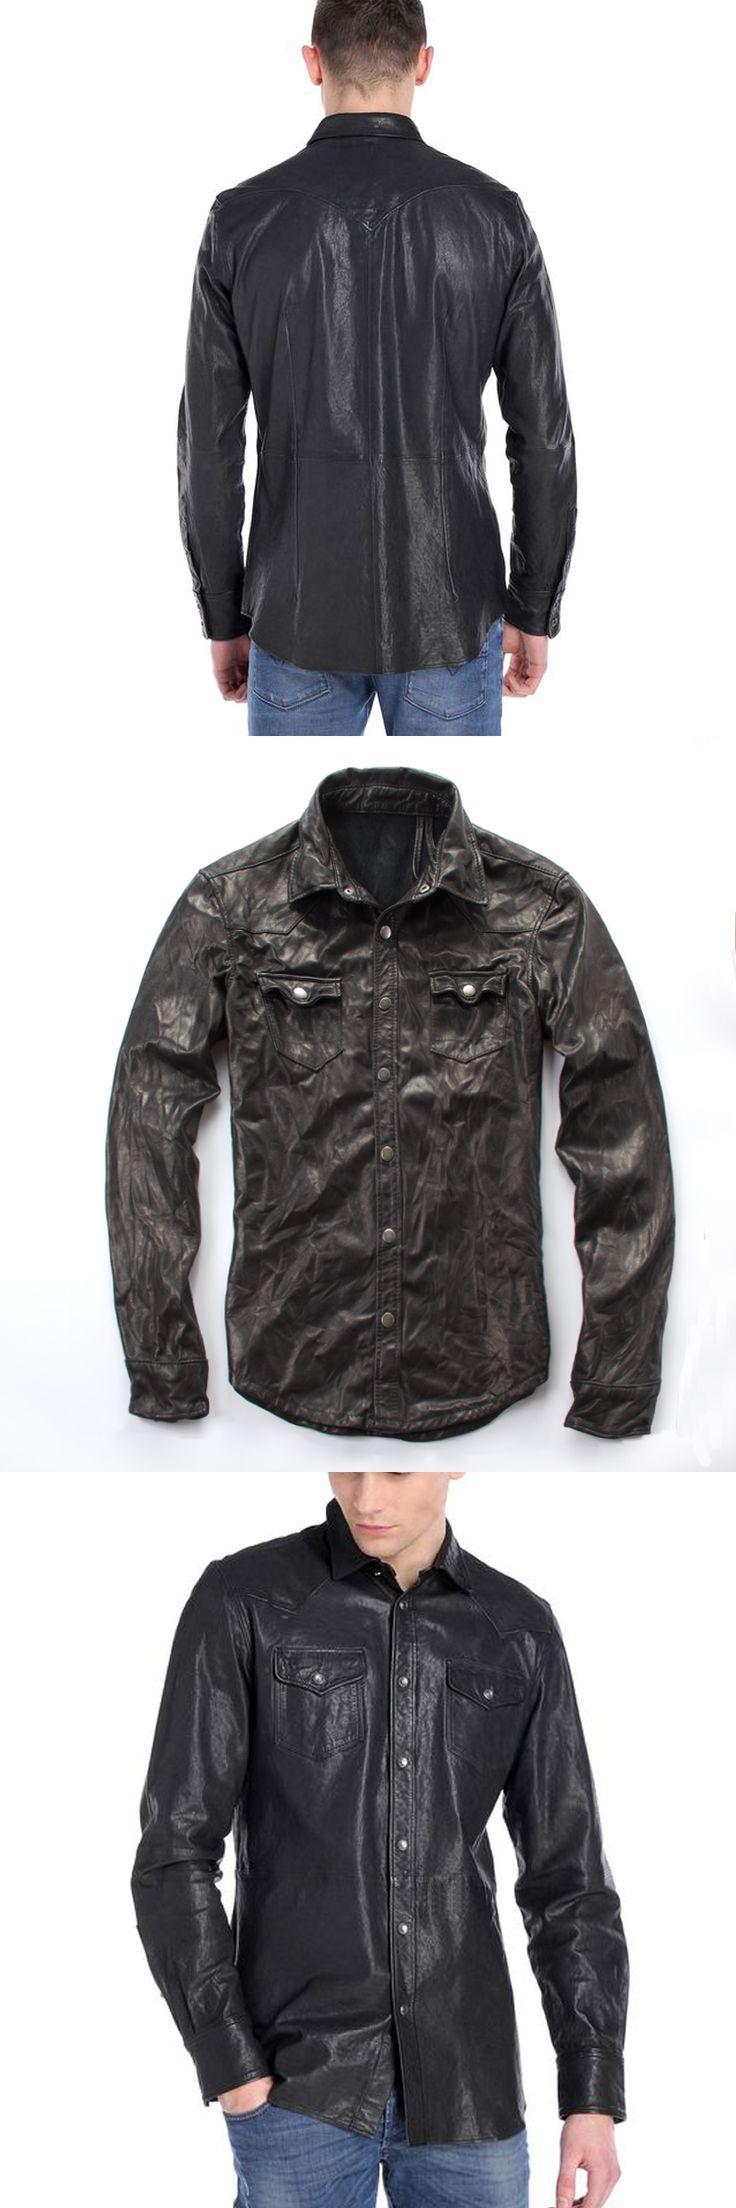 Free shipping.Sales winter warm Sheepskin jackets,men's slim genuine sheep leather,motorcycle biker clothing.Brand